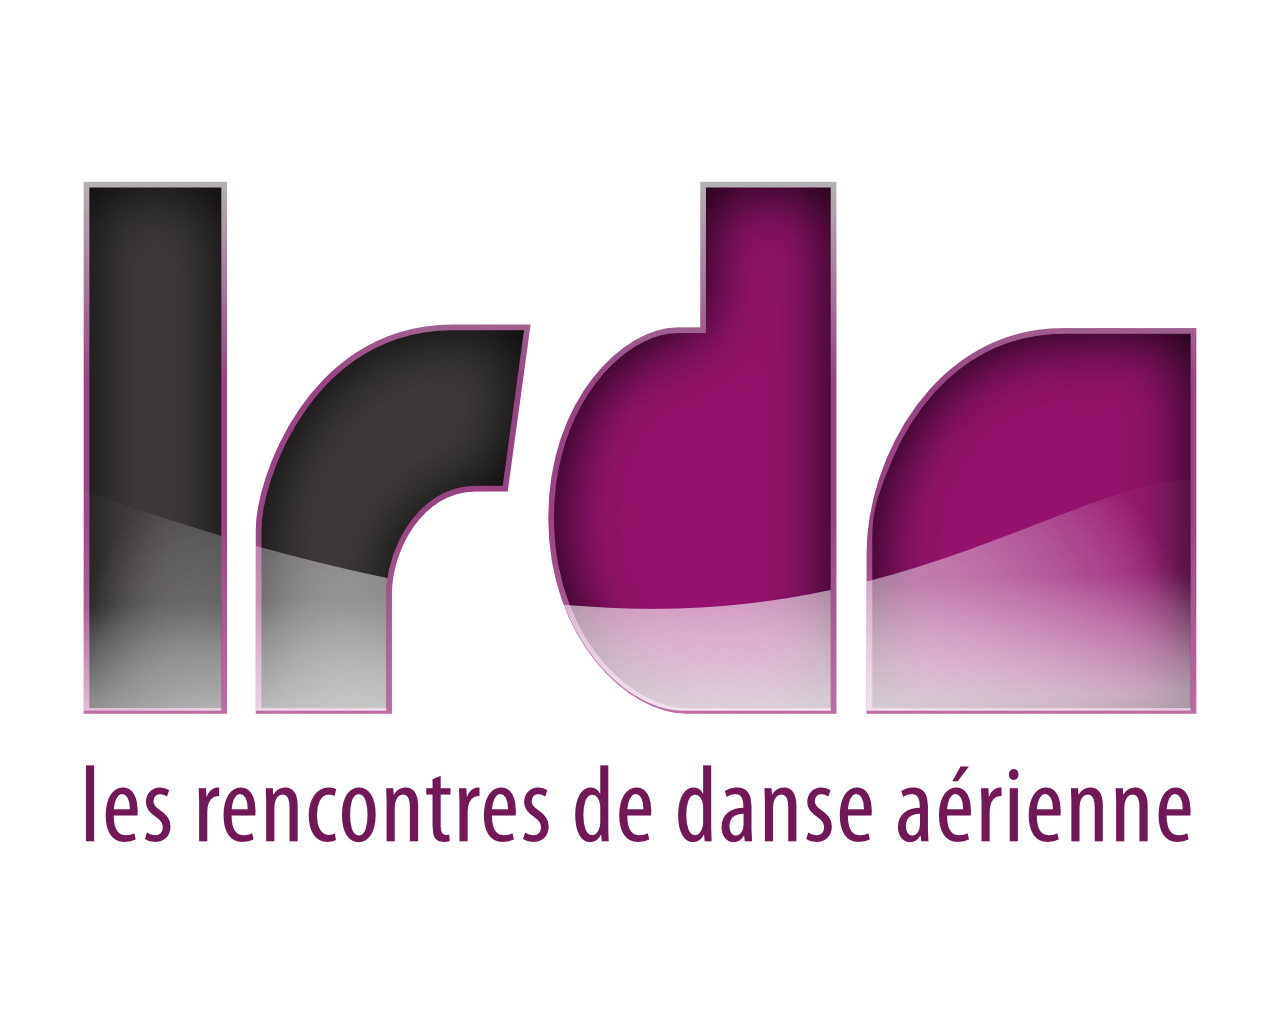 Logo Glossy Lrda Final